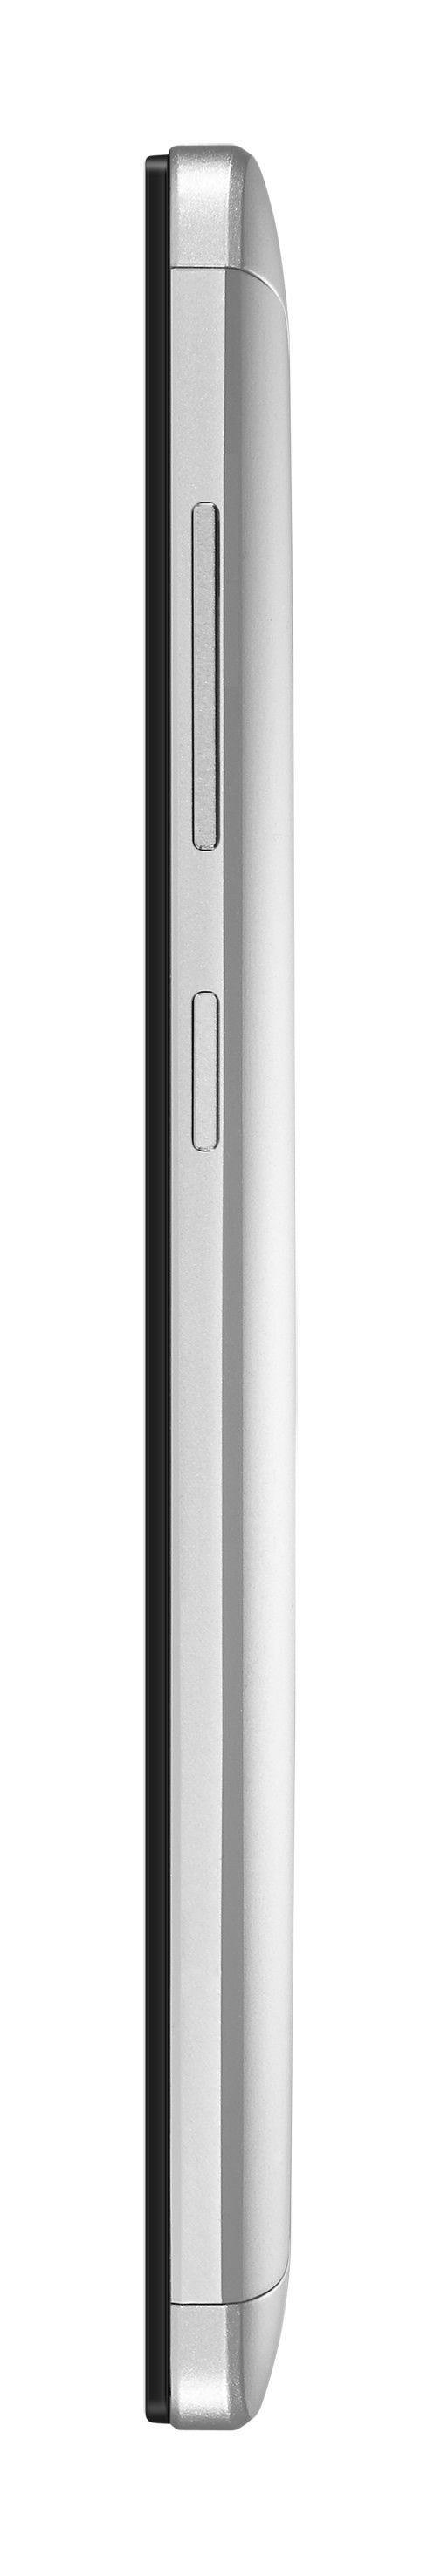 Мобильный телефон Lenovo VIBE P1 Silver - 5